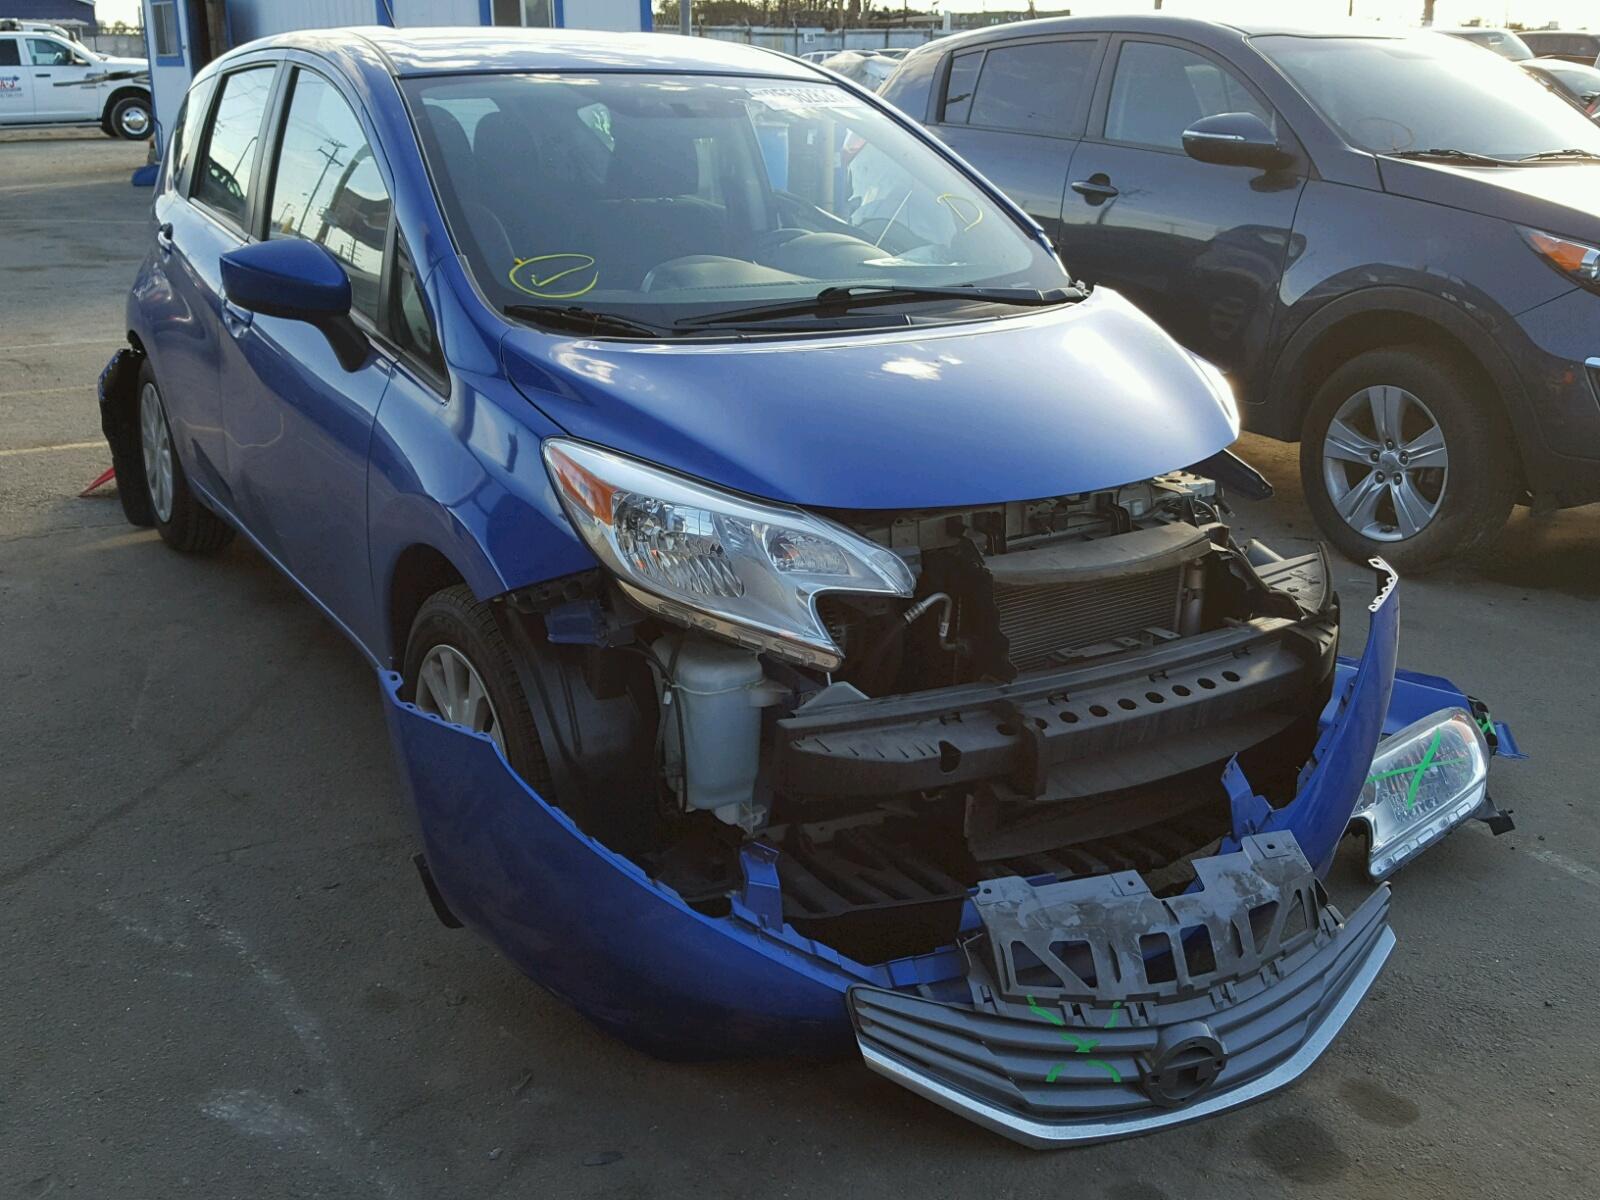 sporty s adds list book nissan ish auto kbb sr moto school cars of trim versa among best kelley back note to blue com